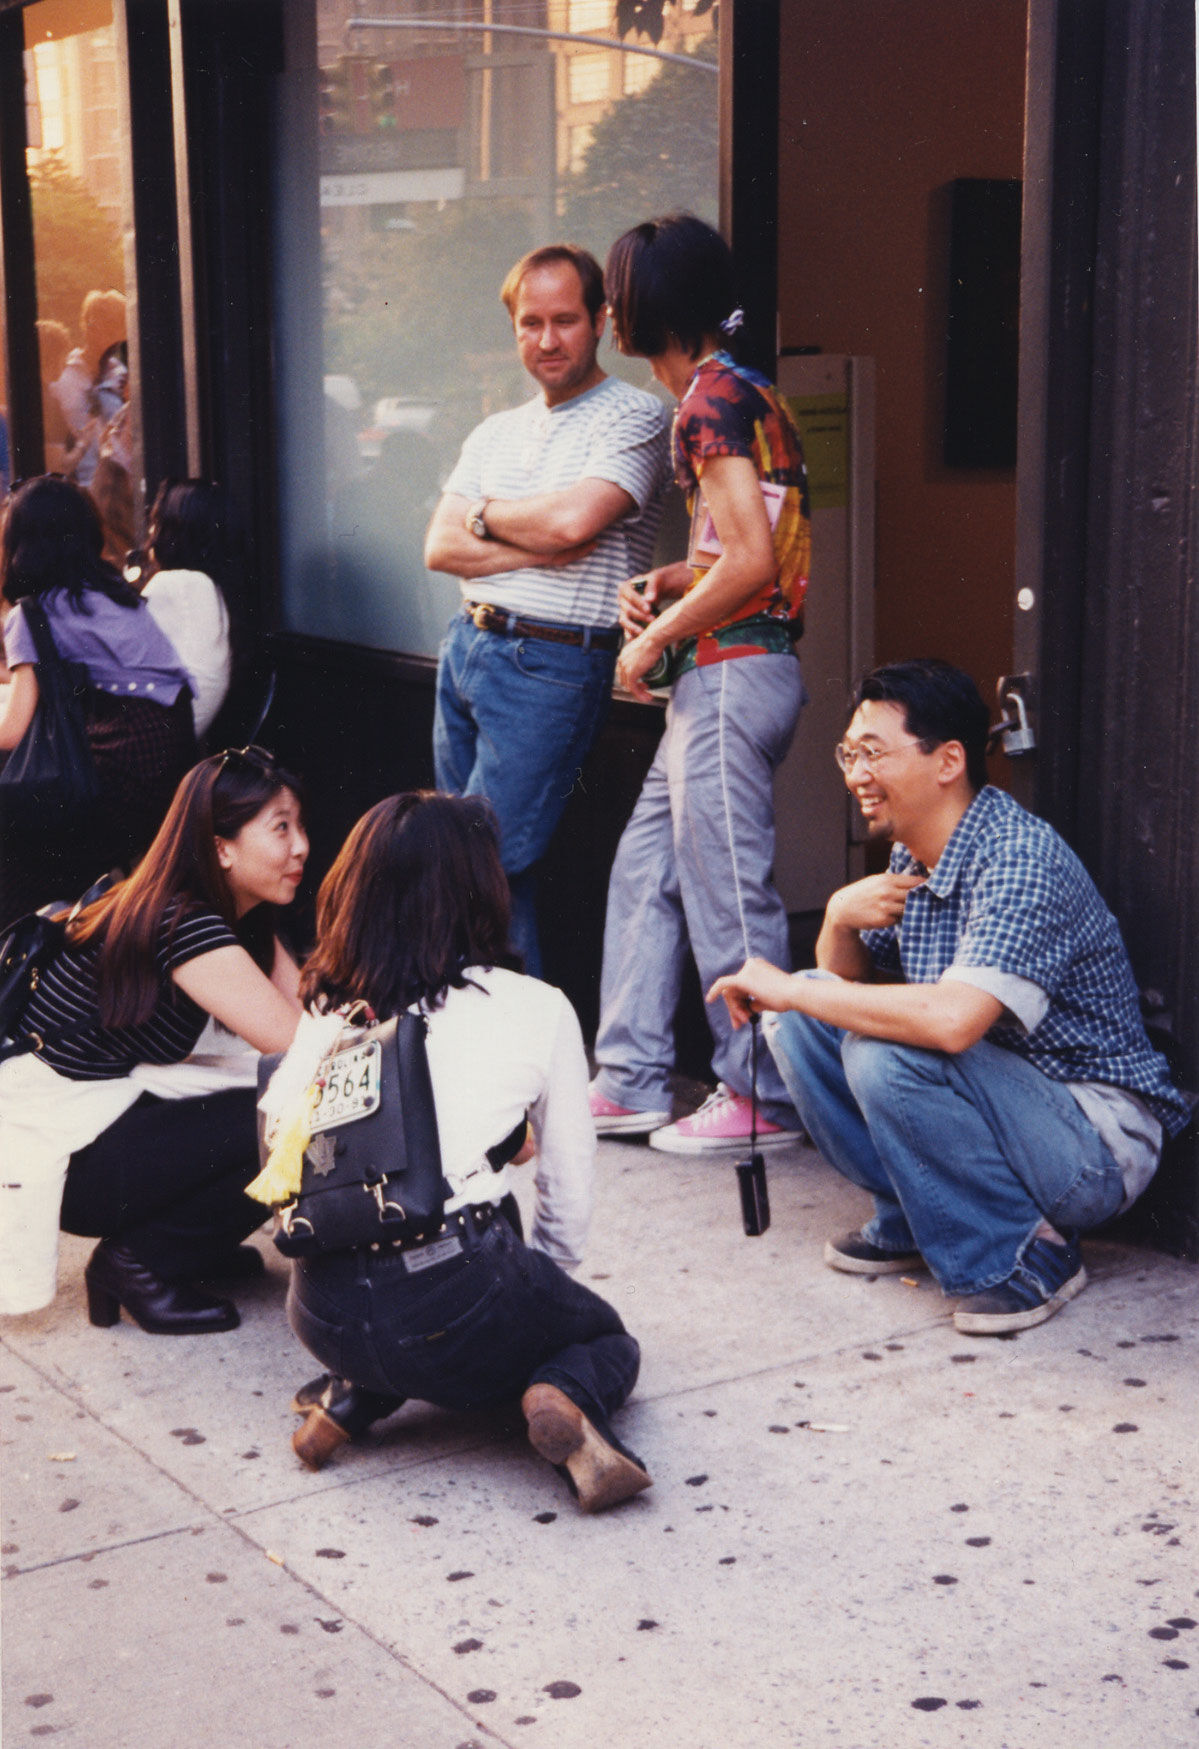 """At the opening of my solo show at Gavin Brown's Enterprise in SoHo."" ©︎ Takashi Murakami/Kaikai Kiki Co., Ltd. All Rights Reserved. Courtesy of Gagosian."